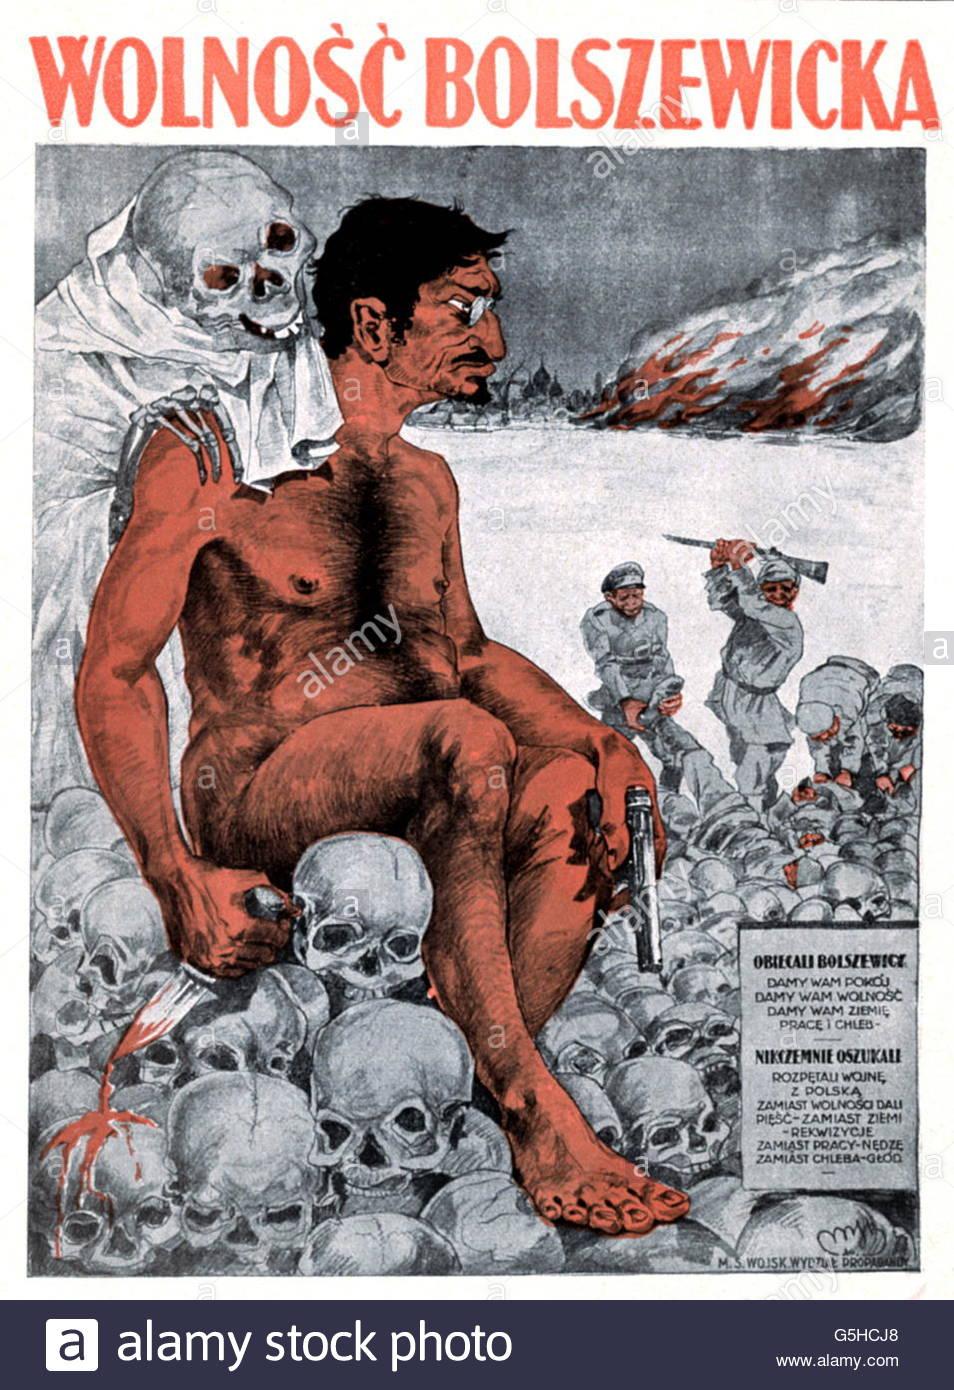 Trotsky, Leon (Lev Davidovich Bronstein), 7.11.1879 - 21.8 1940, Soviet politician, anti-Semitic caricature by Skabowski, - Stock Image